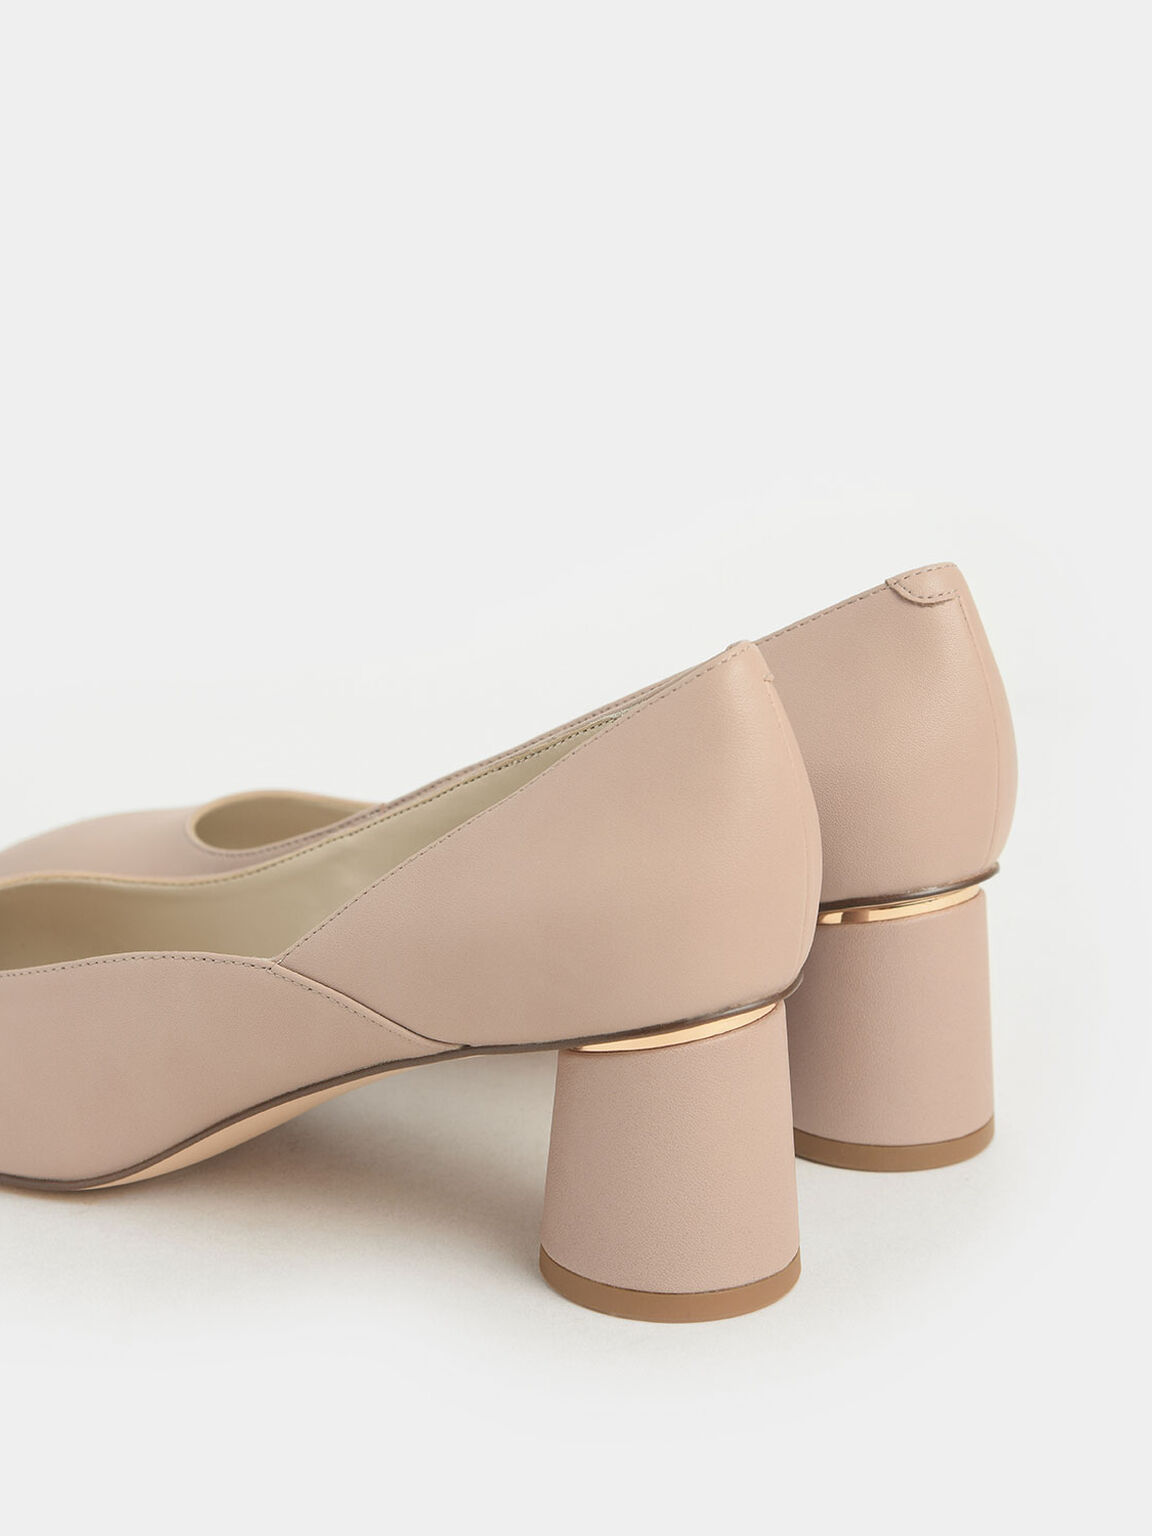 圓柱粗跟鞋, 膚色, hi-res